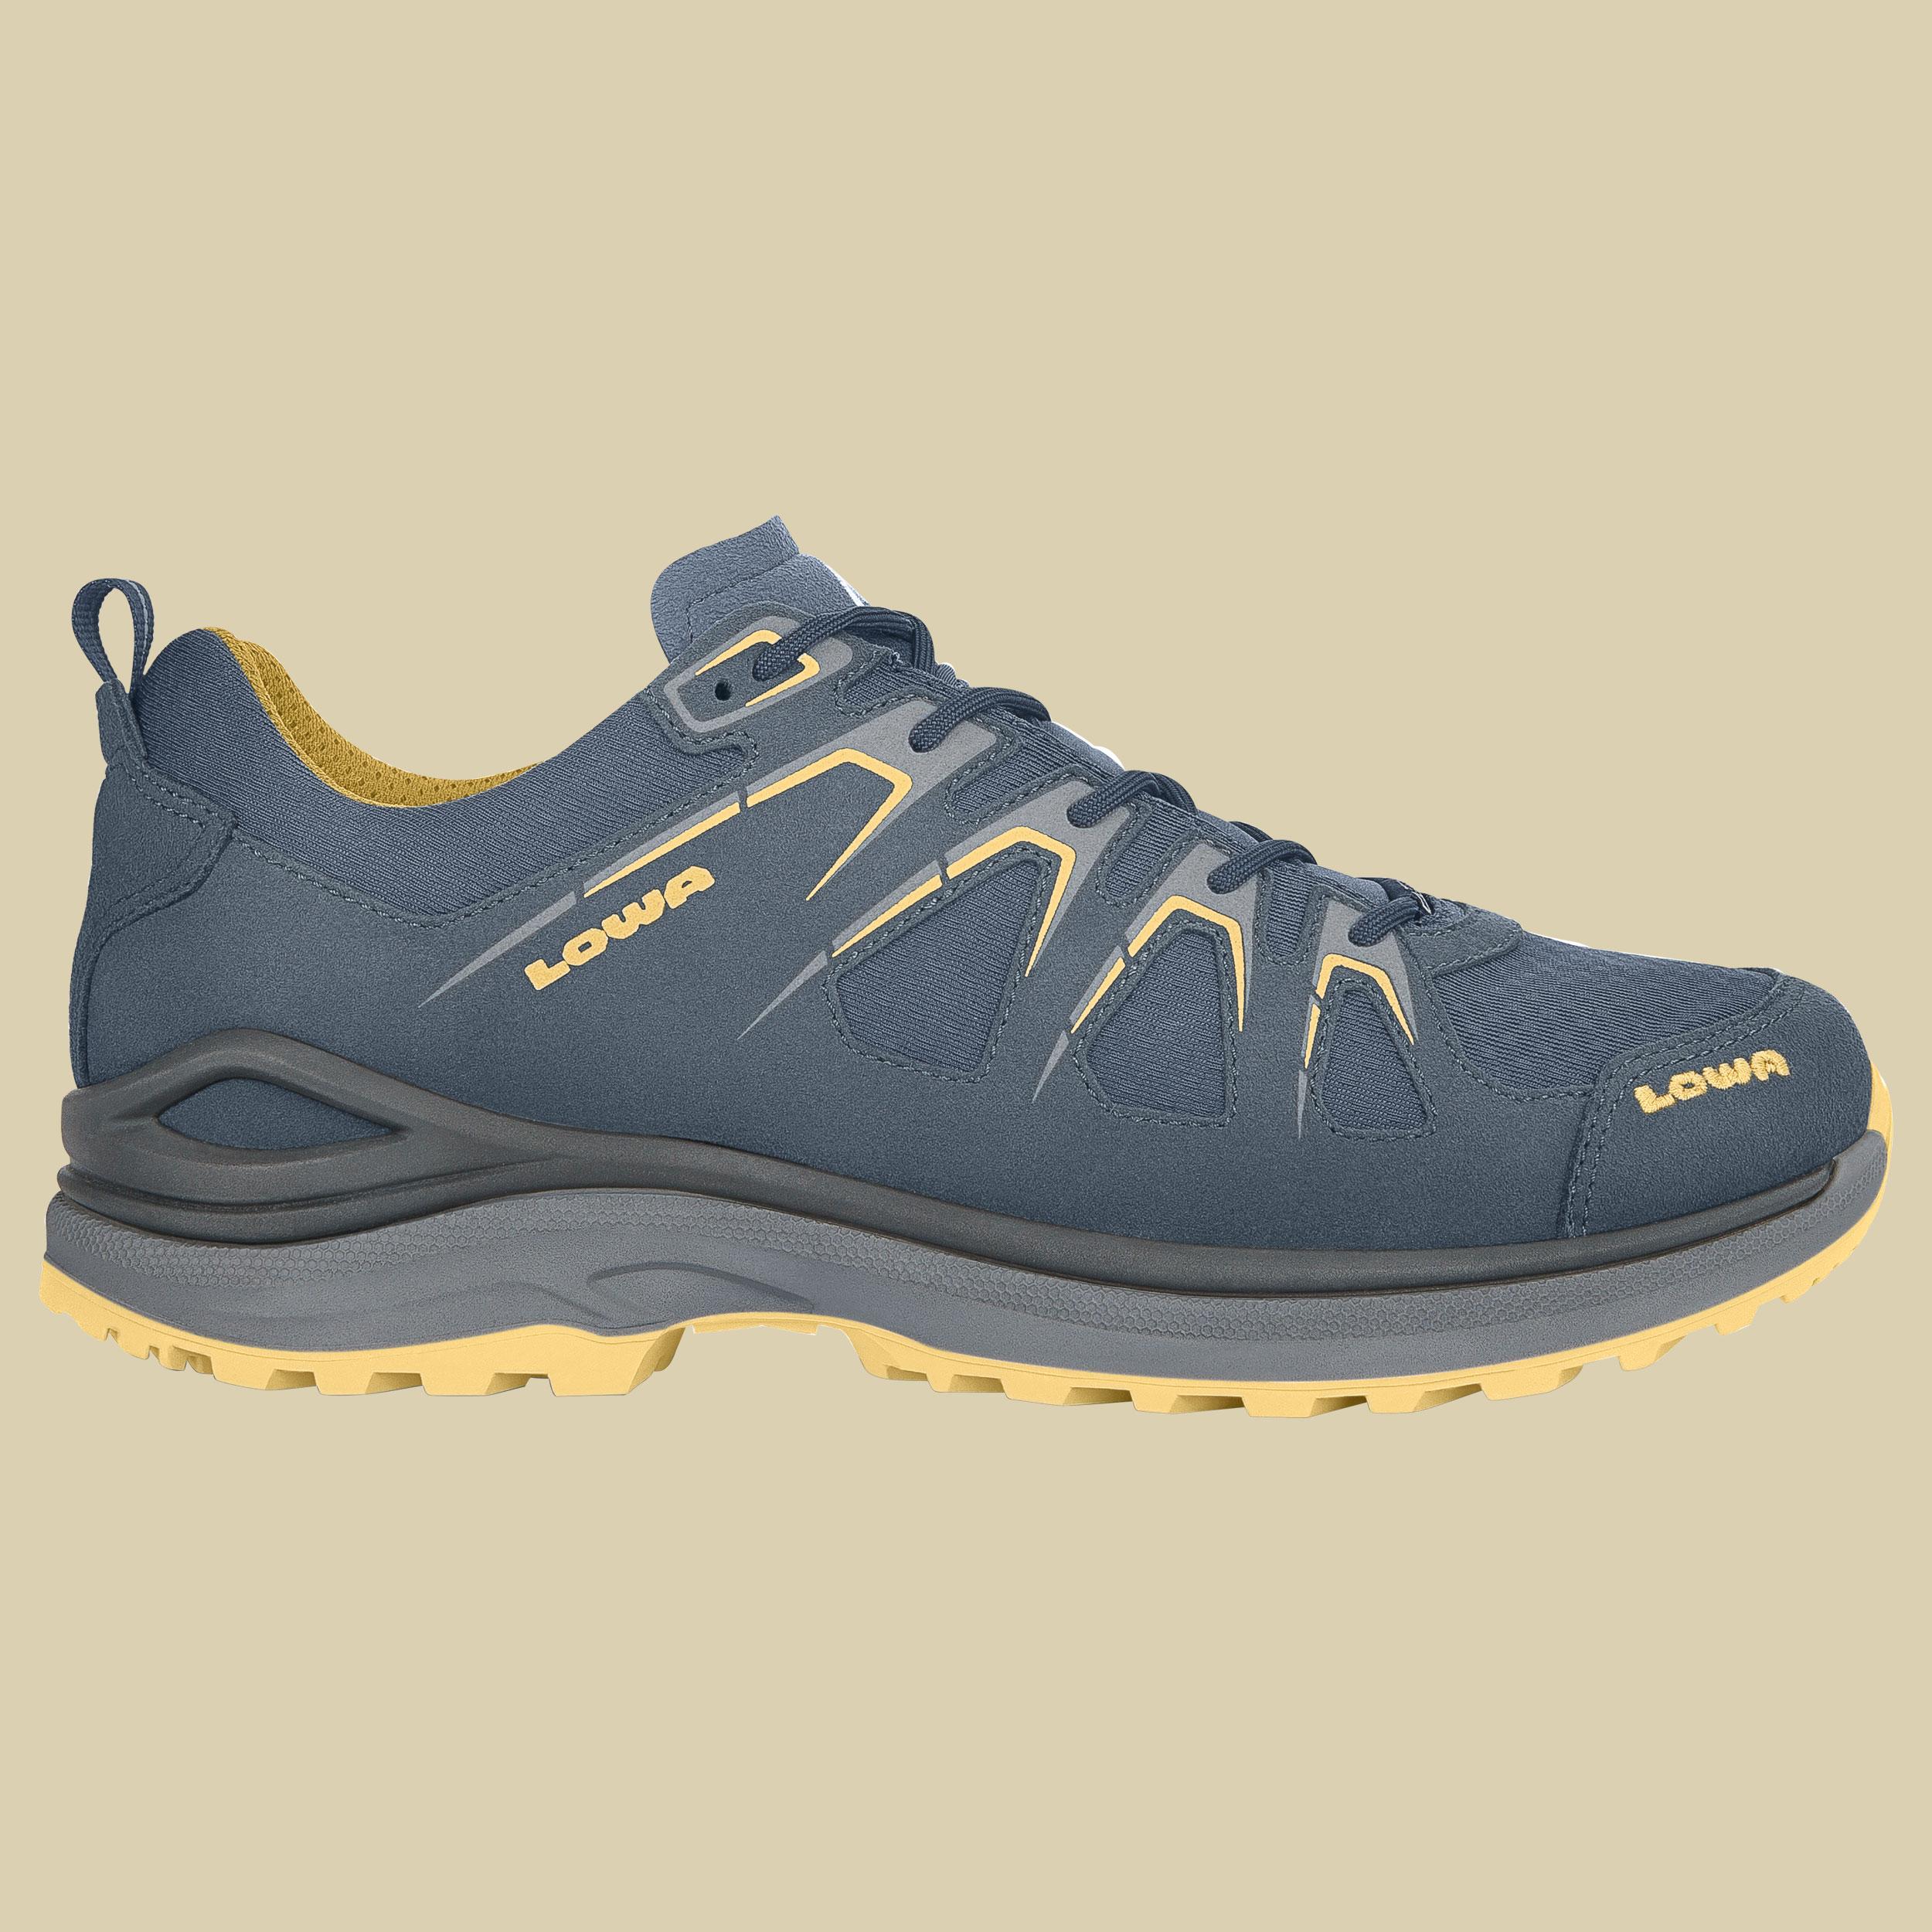 Lowa Innox Evo GTX Low Men Outdoor Fitness Schuh  Größe UK 7,5 stahlblau/senf